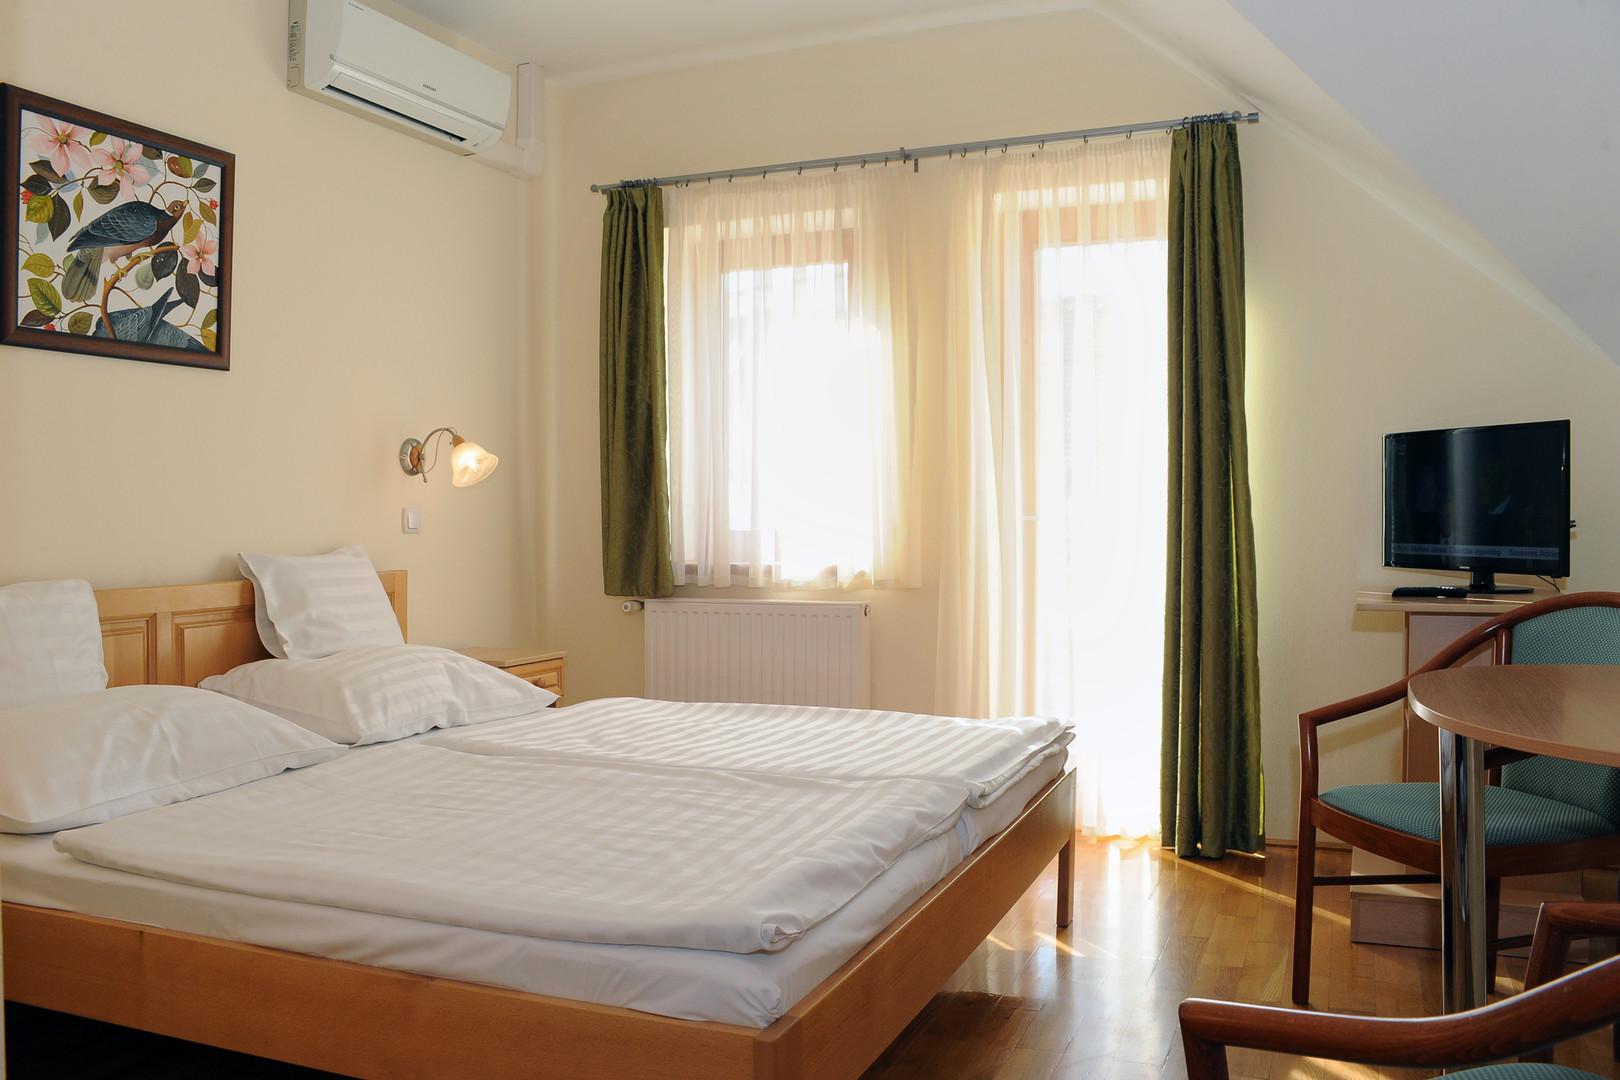 Hotel Ametiszt #6